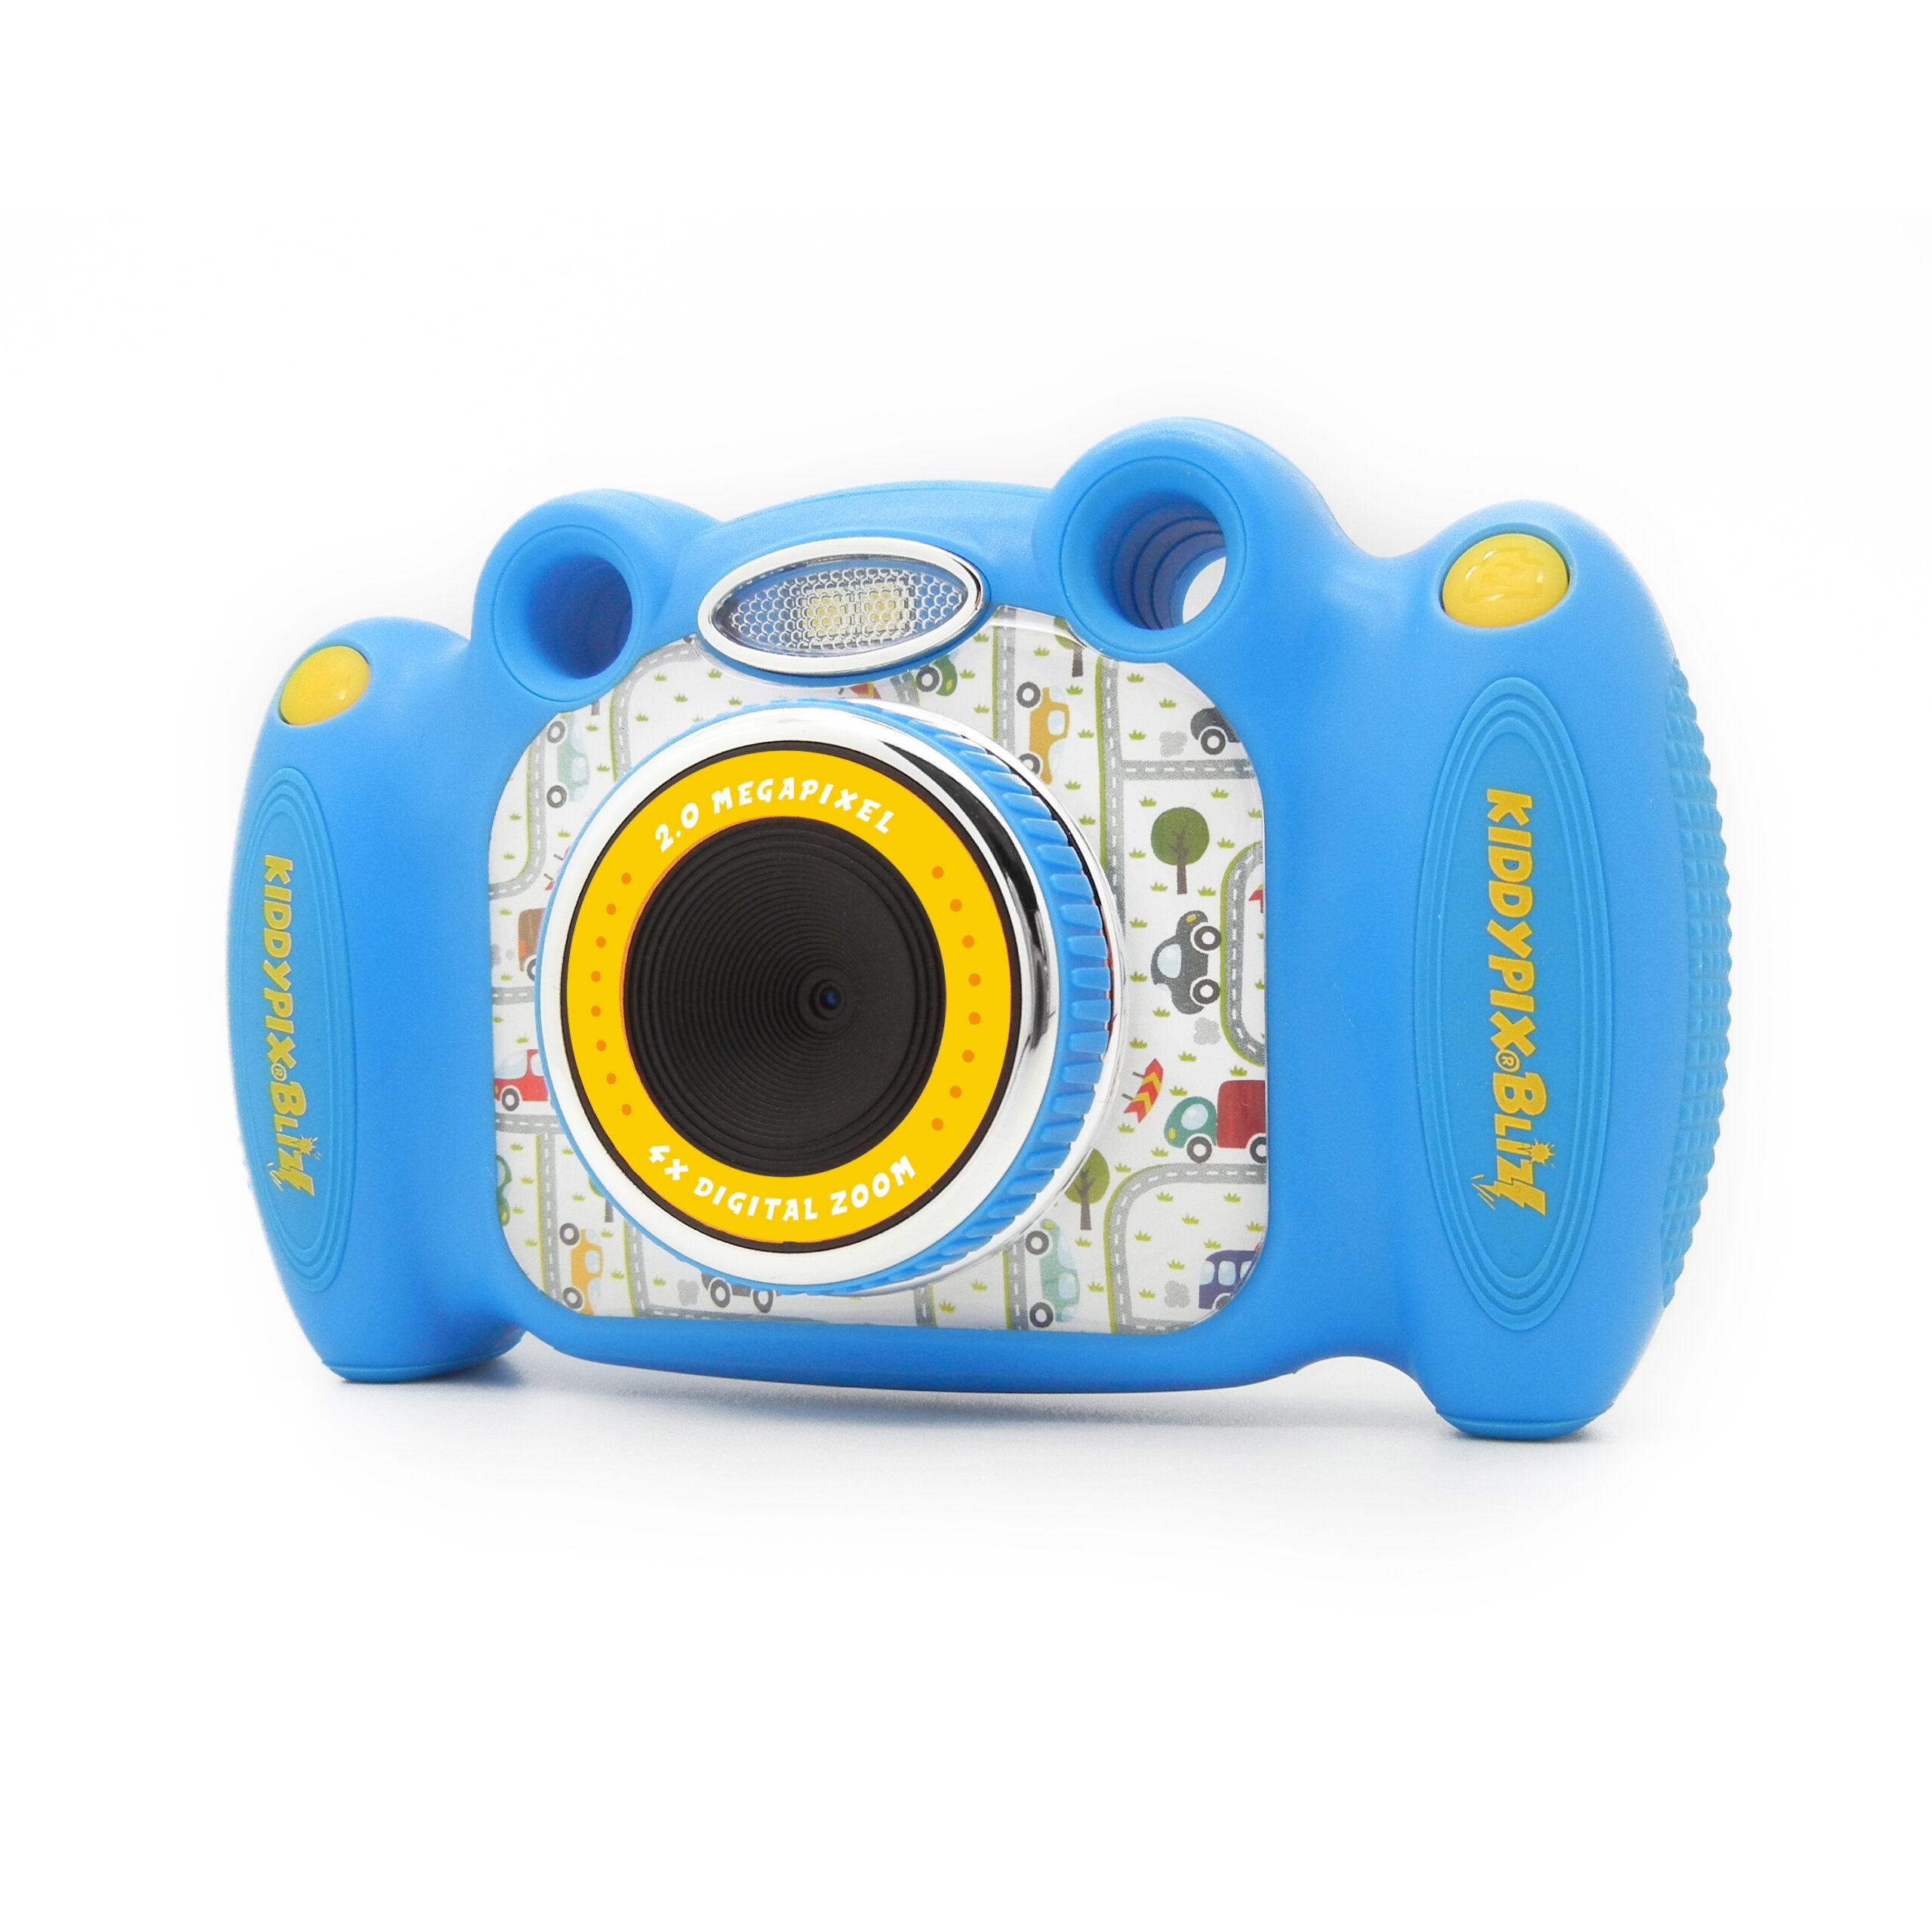 Easypix Kinder Digitalkamera KiddyPix Blizz (plava)